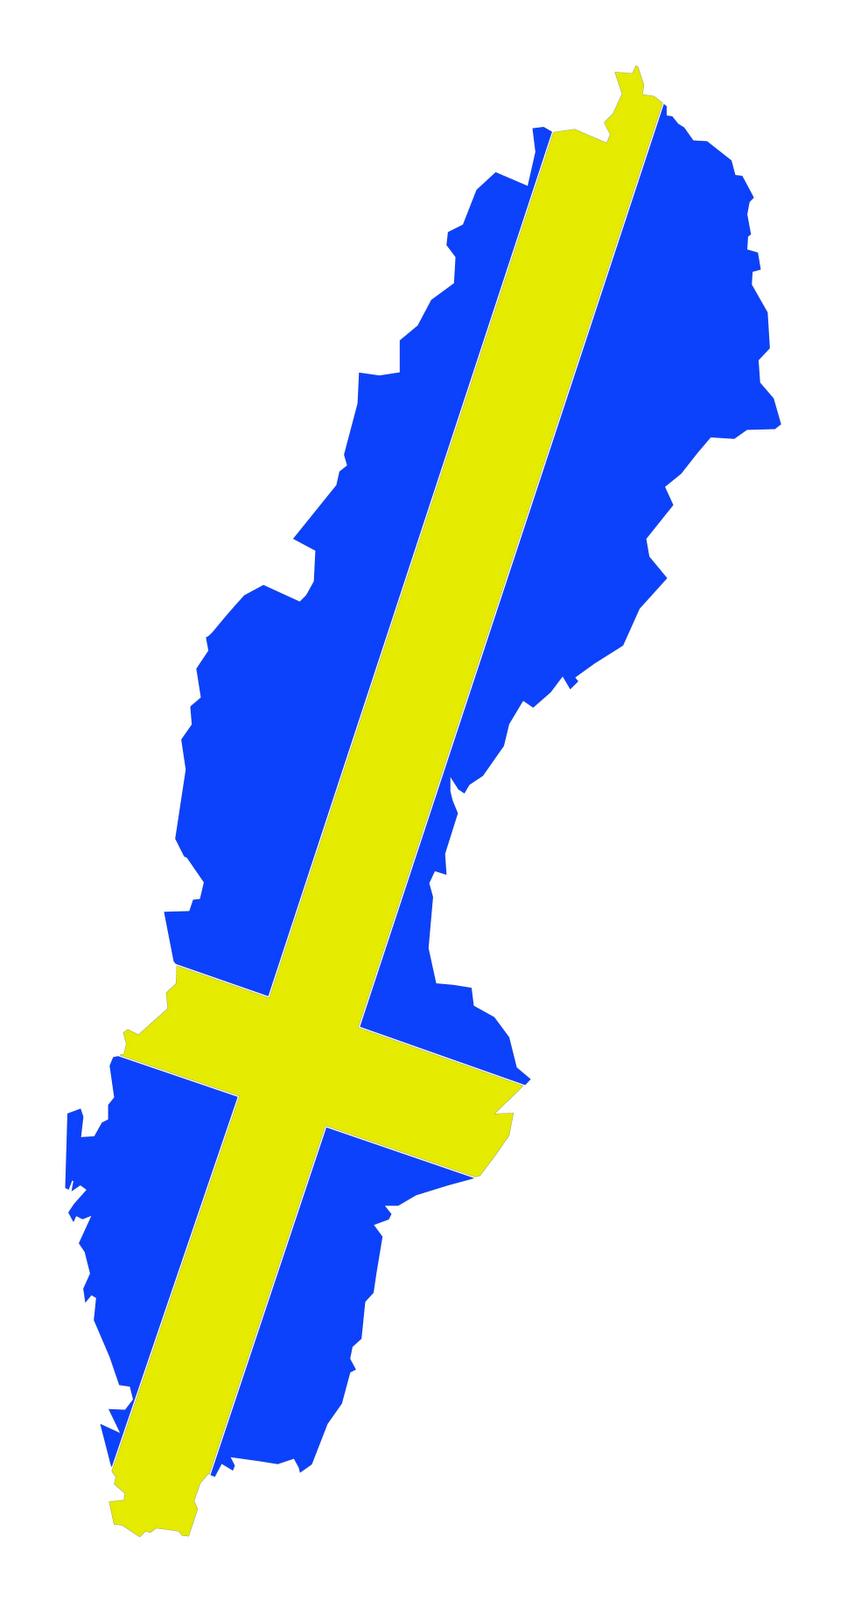 Sweden Flag Pict...M Alphabet Wallpaper